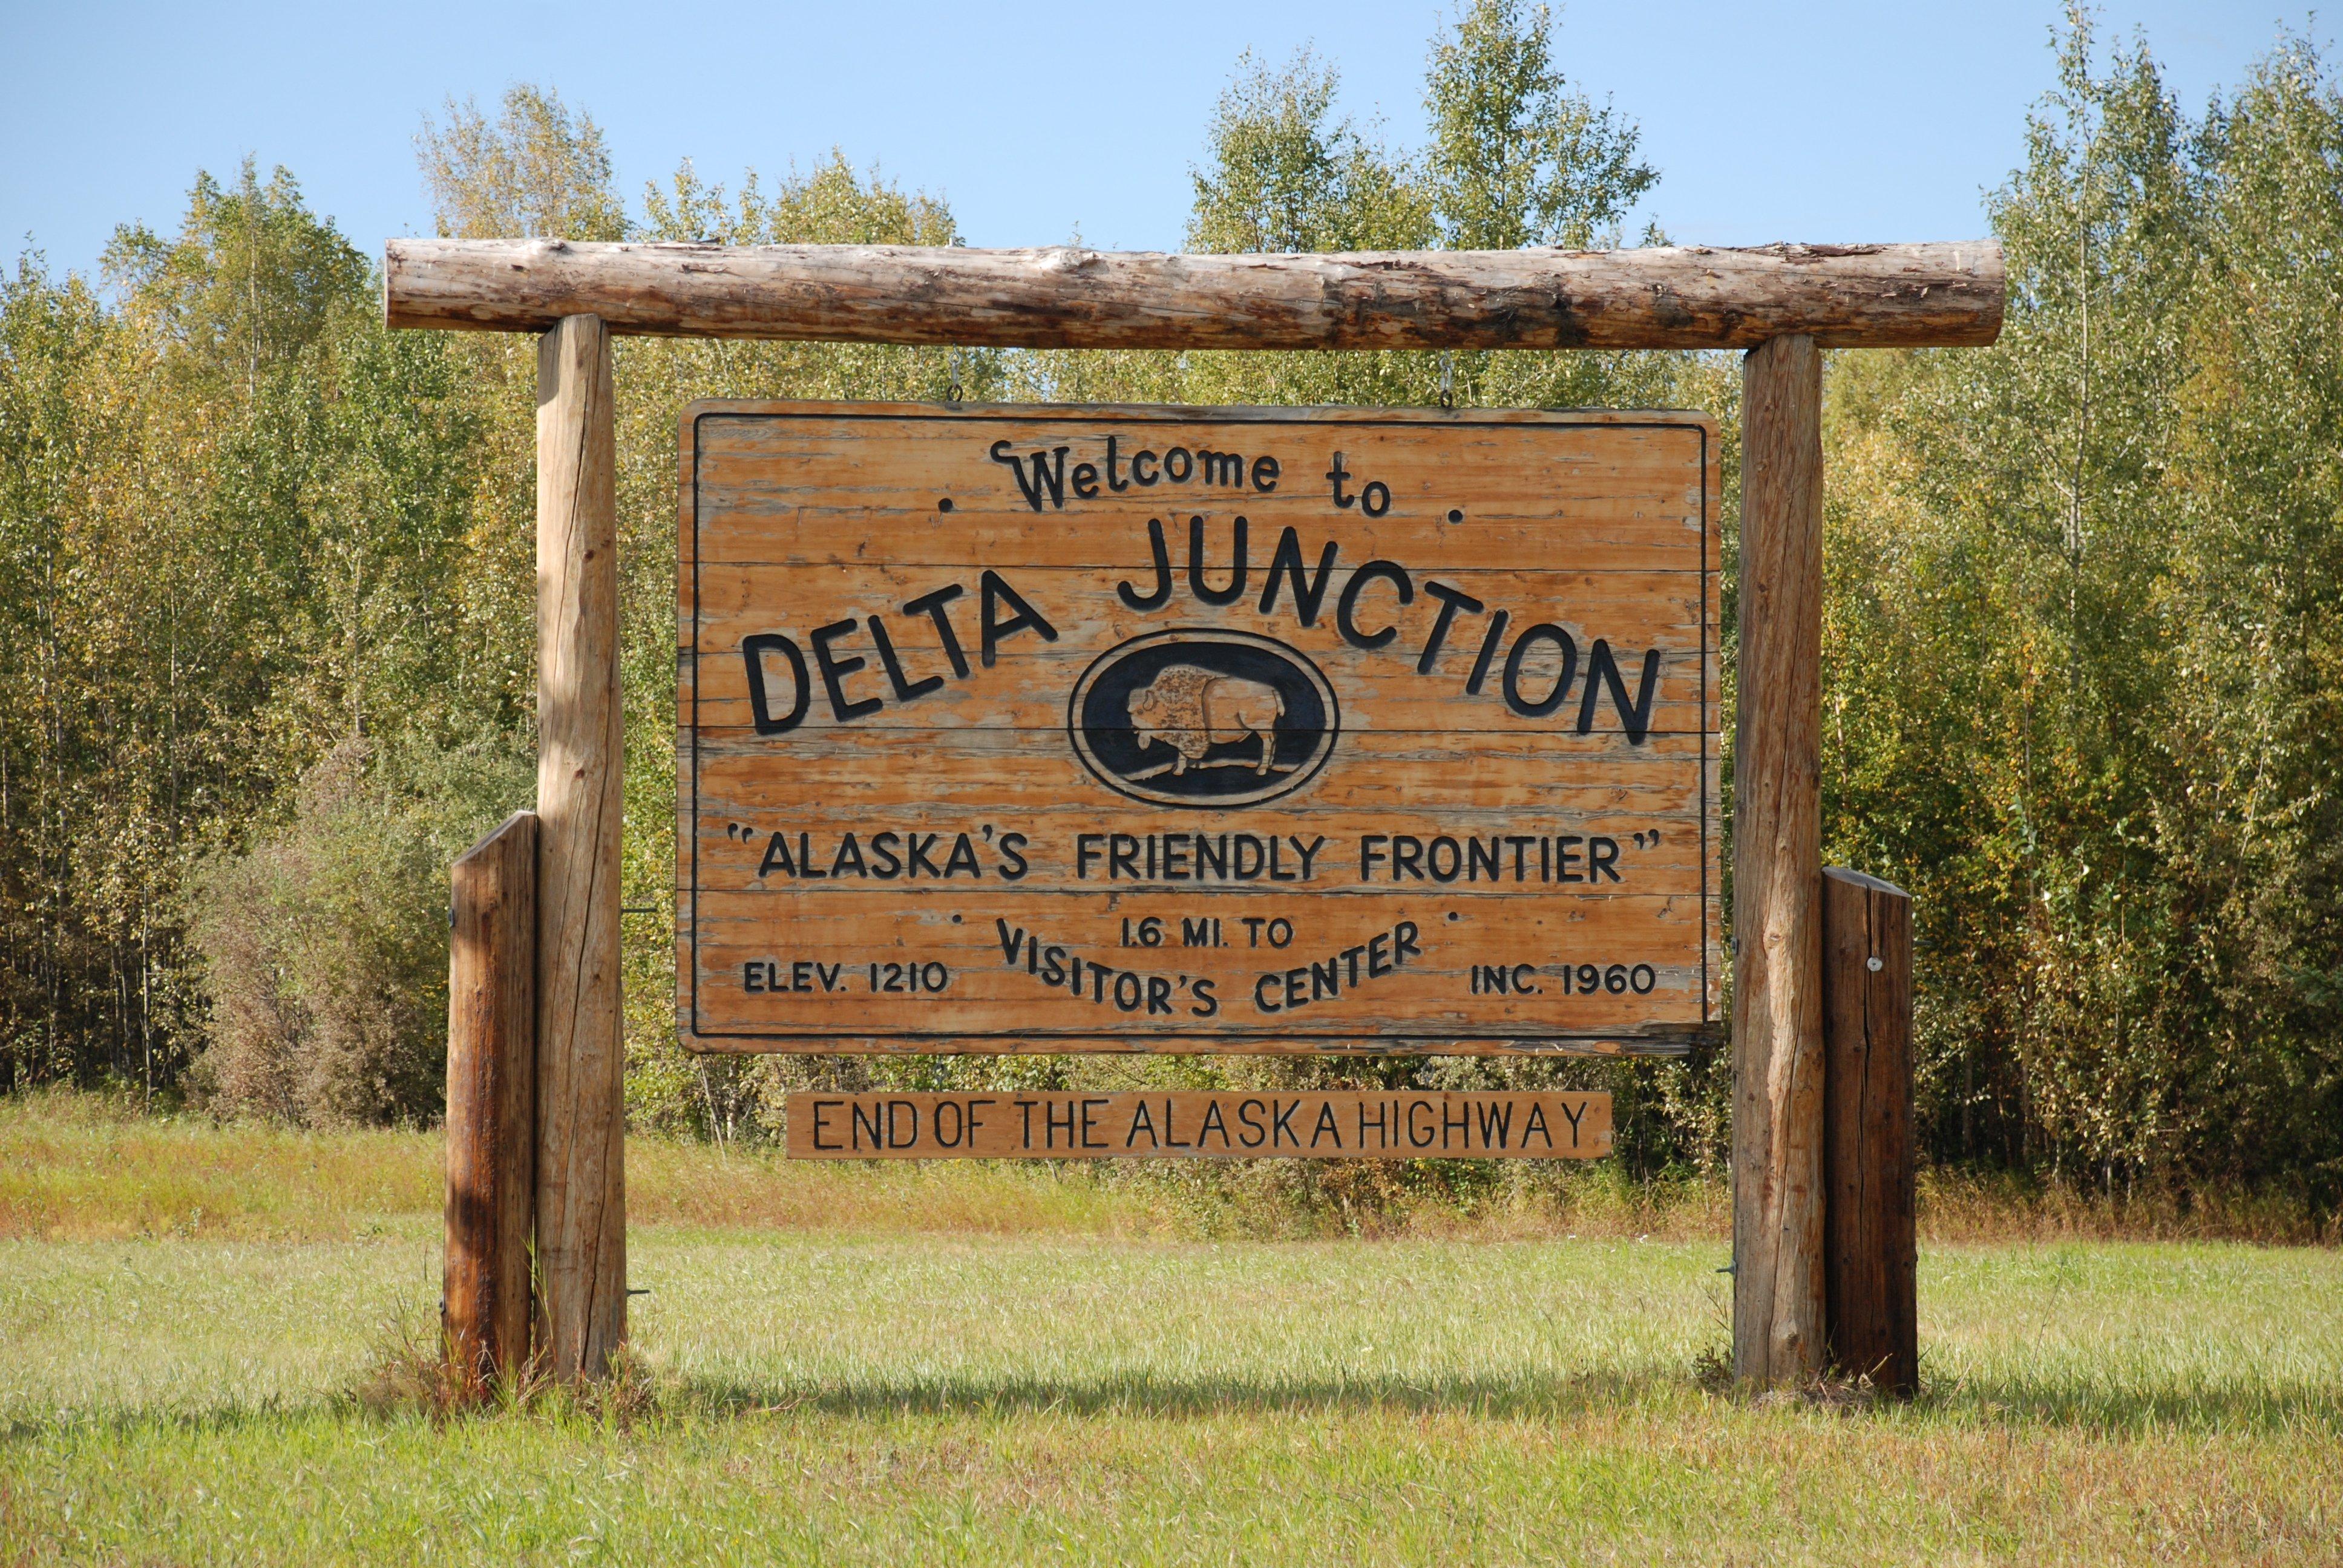 Tuesday, June 4Delta Junction